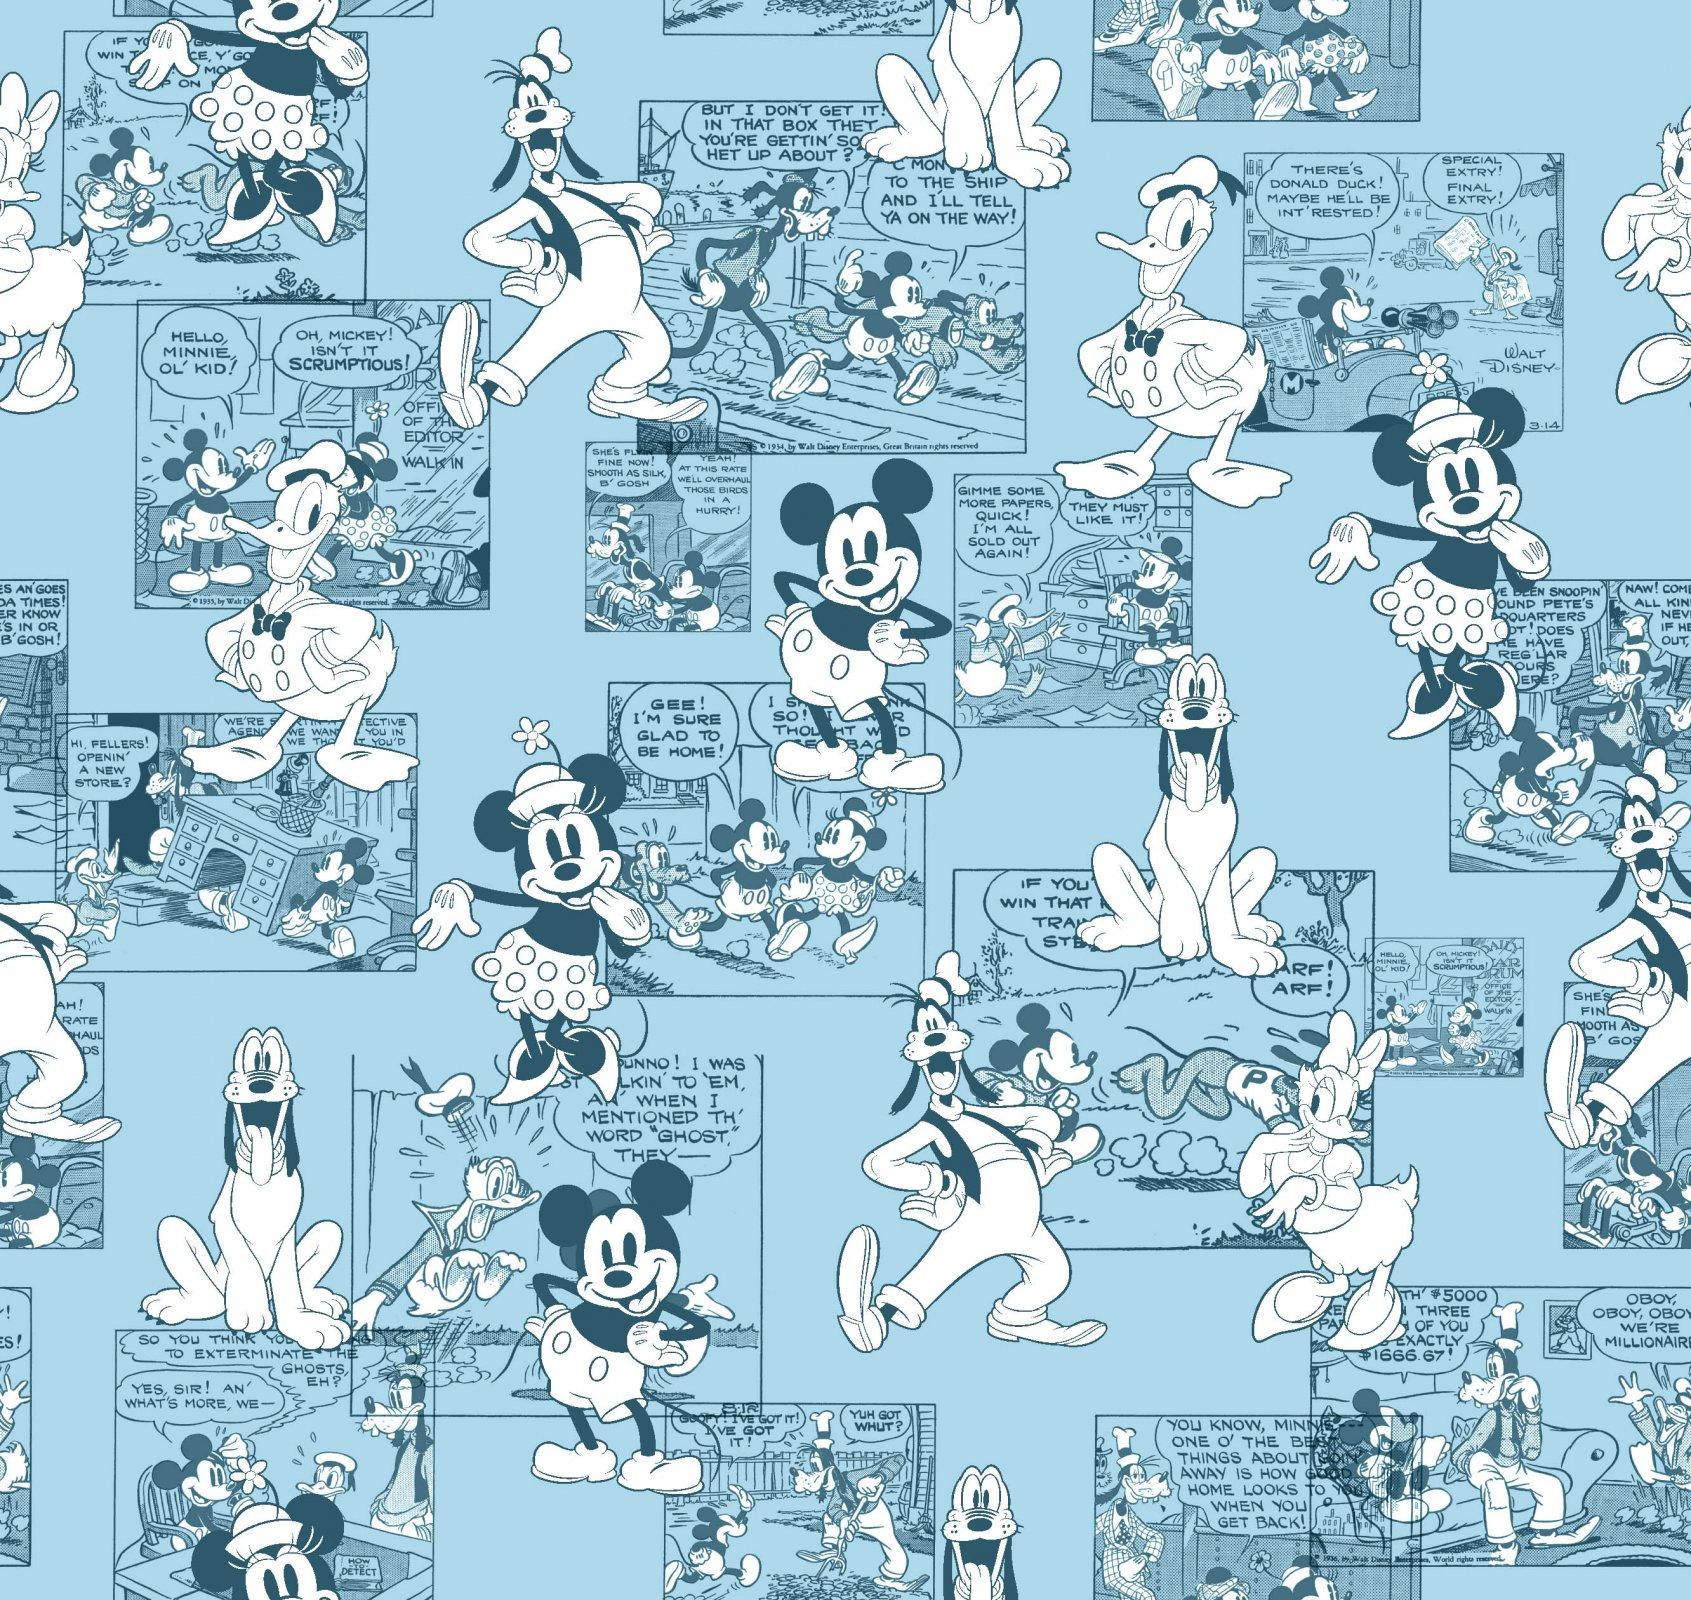 SC-Disney Mickey & Minnie Friends 72916 Sensational 6 Comic Strip